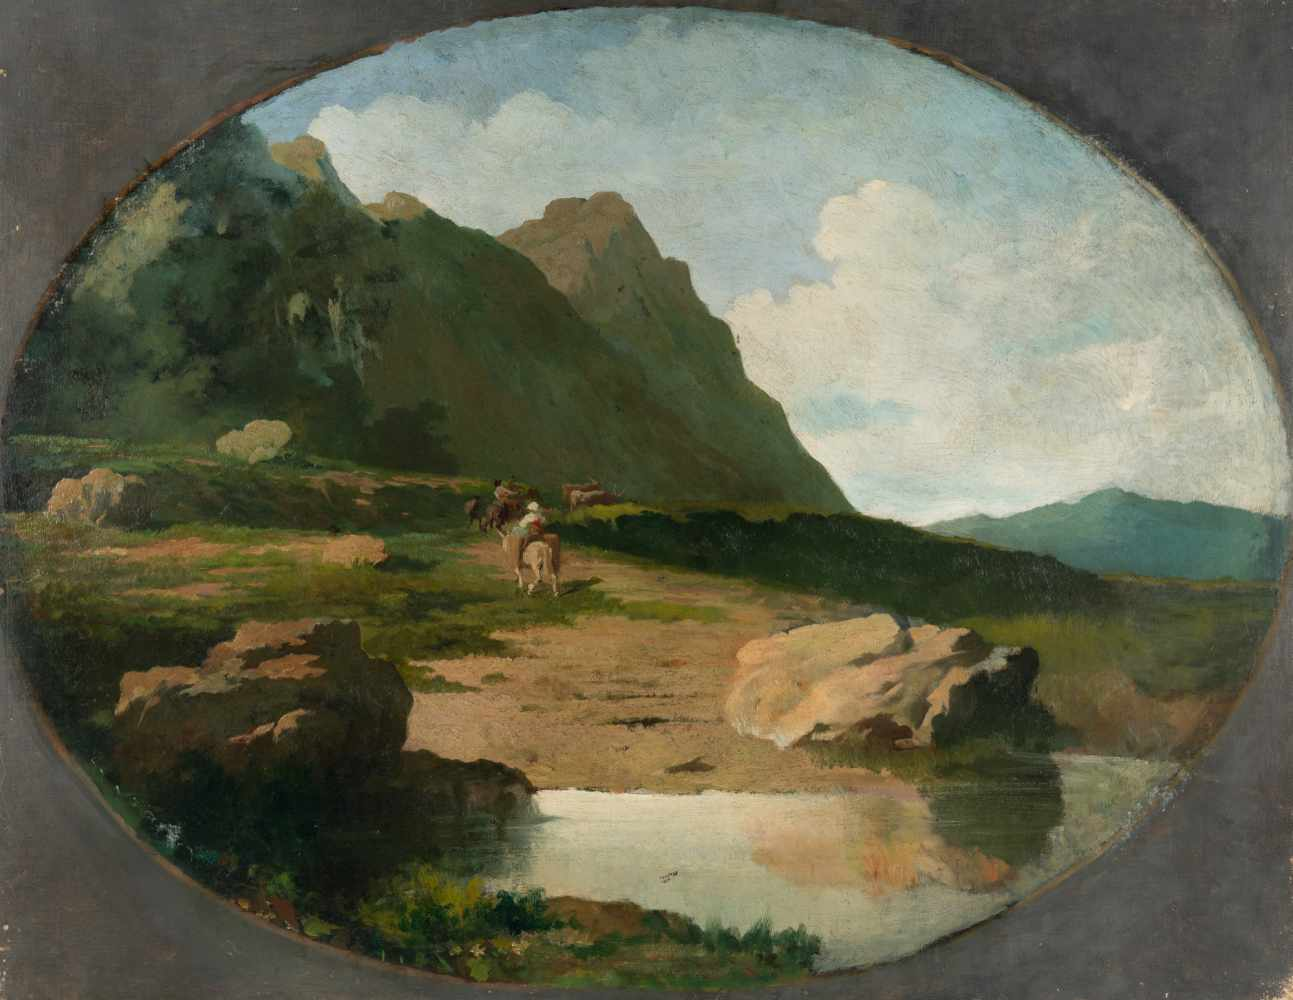 Lot 33 - Anselm Feuerbach1829 Speyer - Venedig 1880Italienische LandschaftÖl auf Leinwand, doubliert. 66,3